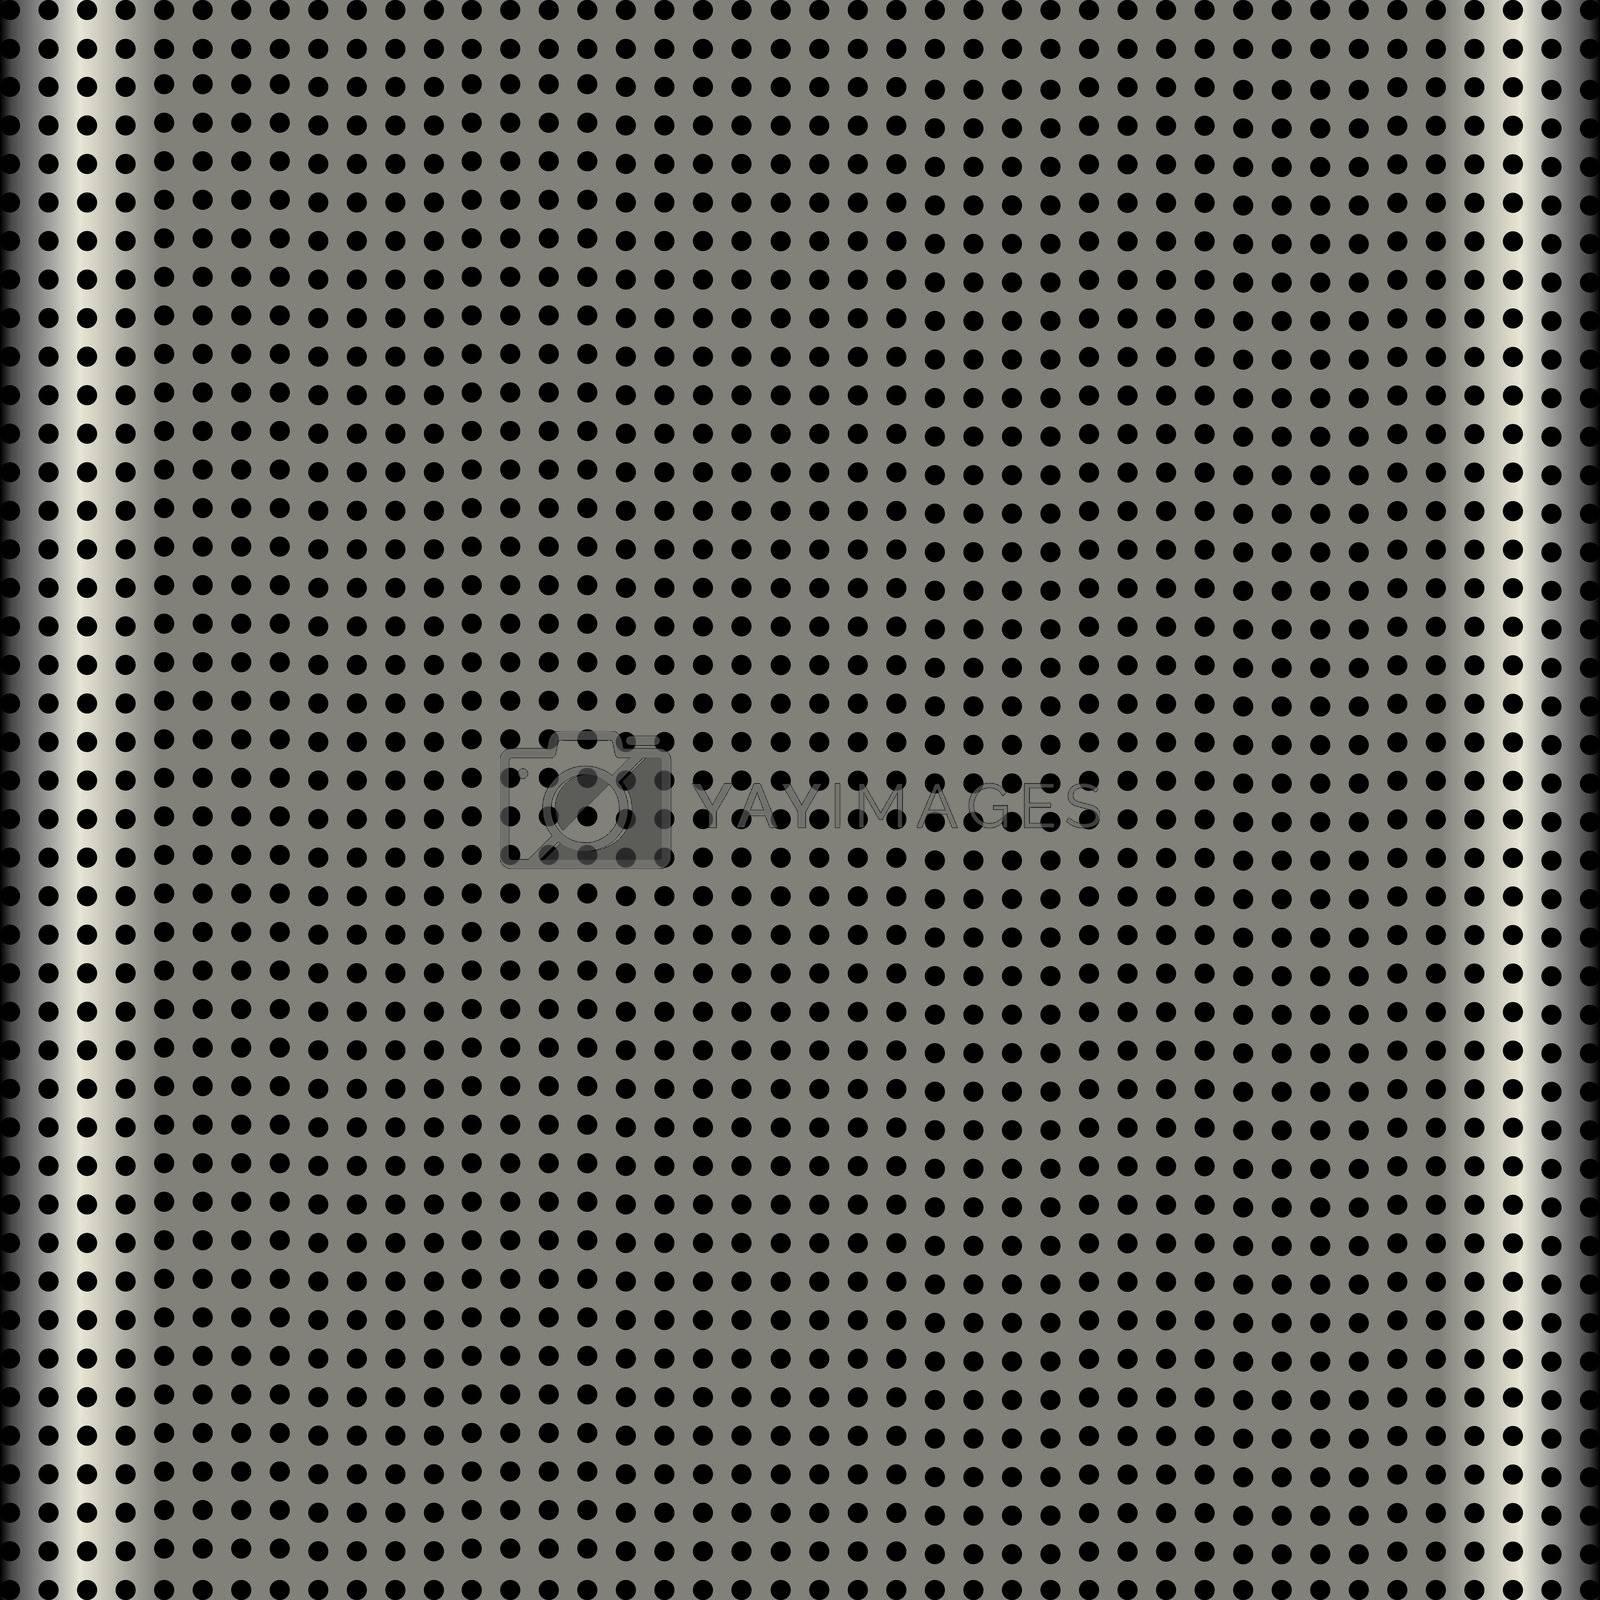 fine aluminum modern speaker grill texture